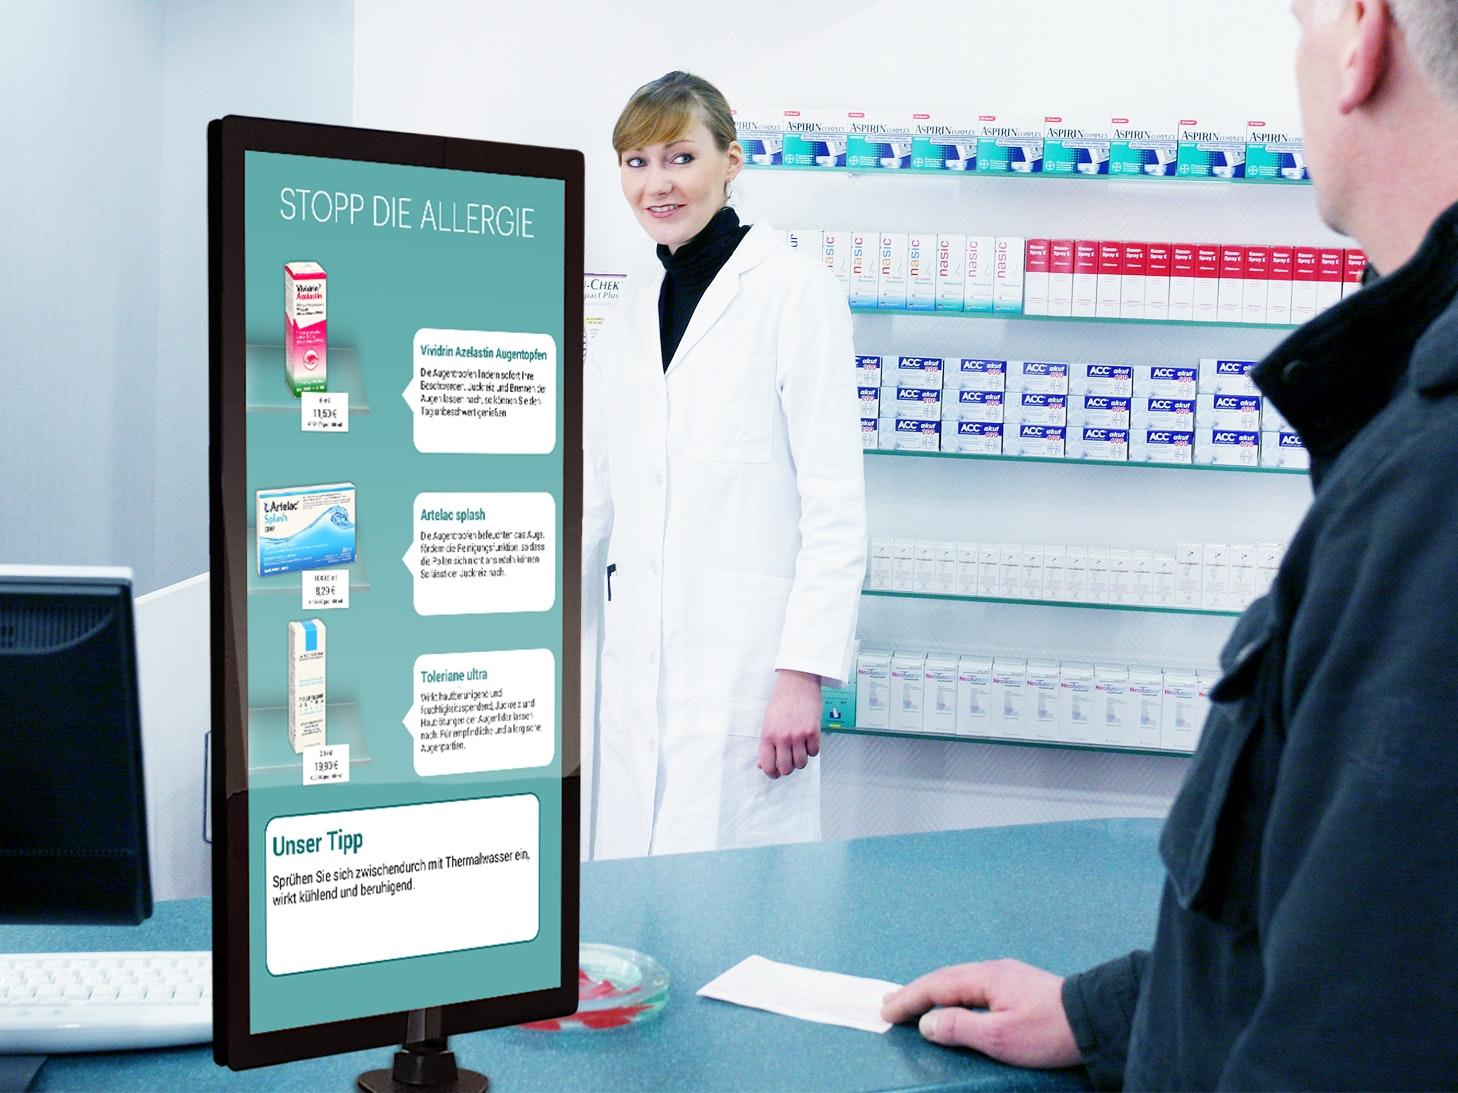 APOSTORE Digitale Loesungen HV Display Beratungssituation